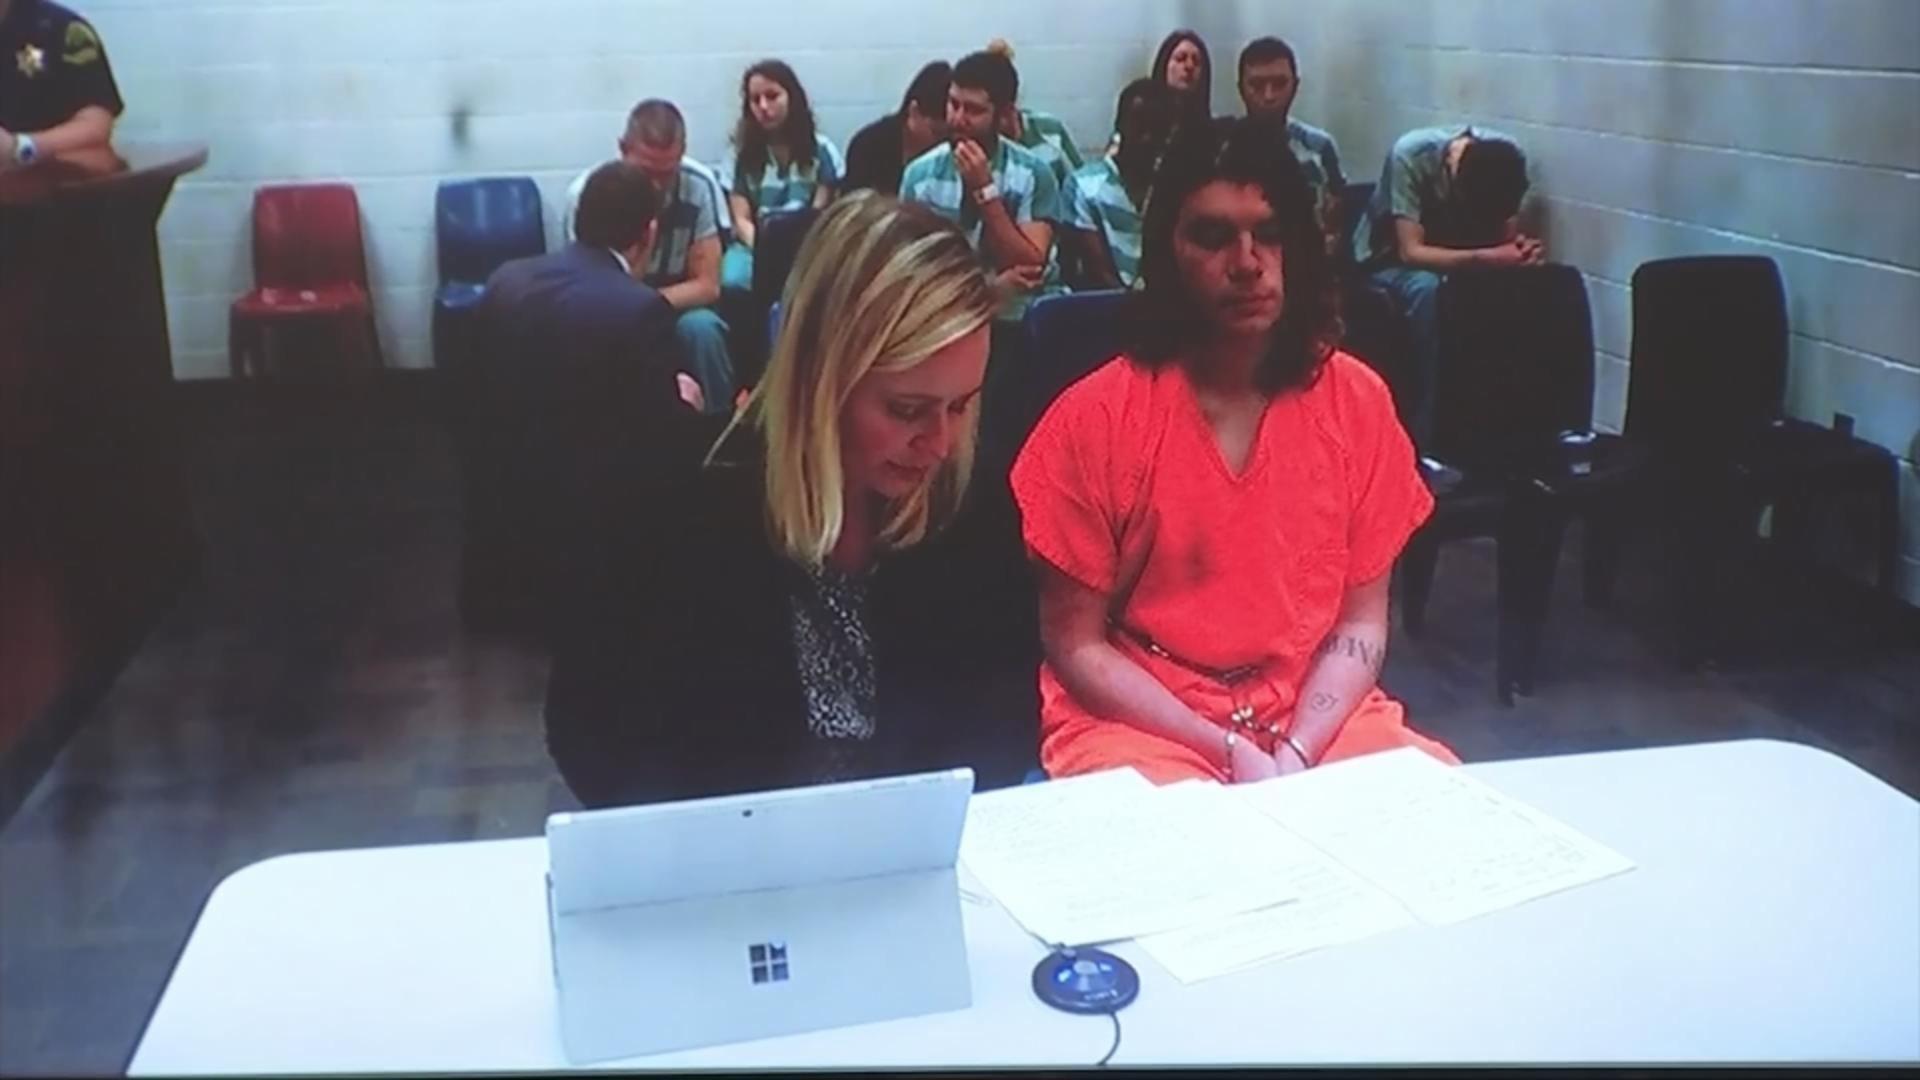 Generic Blog - Washington Teen Sentenced 22 Years For Foiled School Shooting Plot